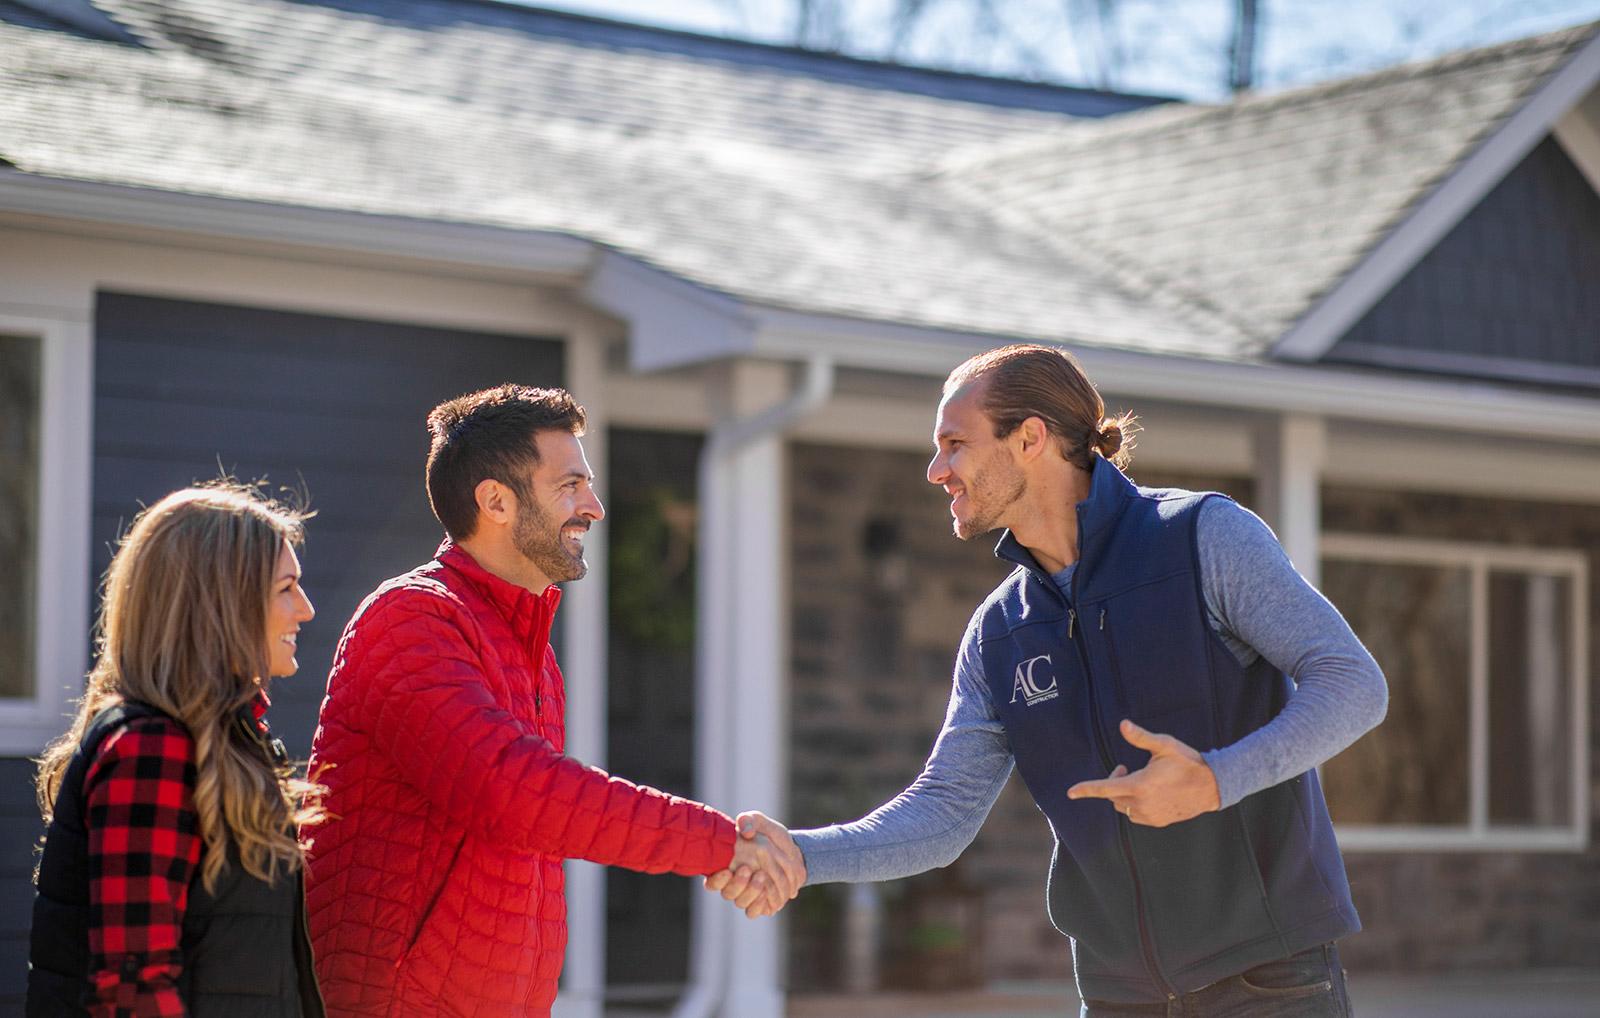 roofing-siding-reviews-testimonials.jpg